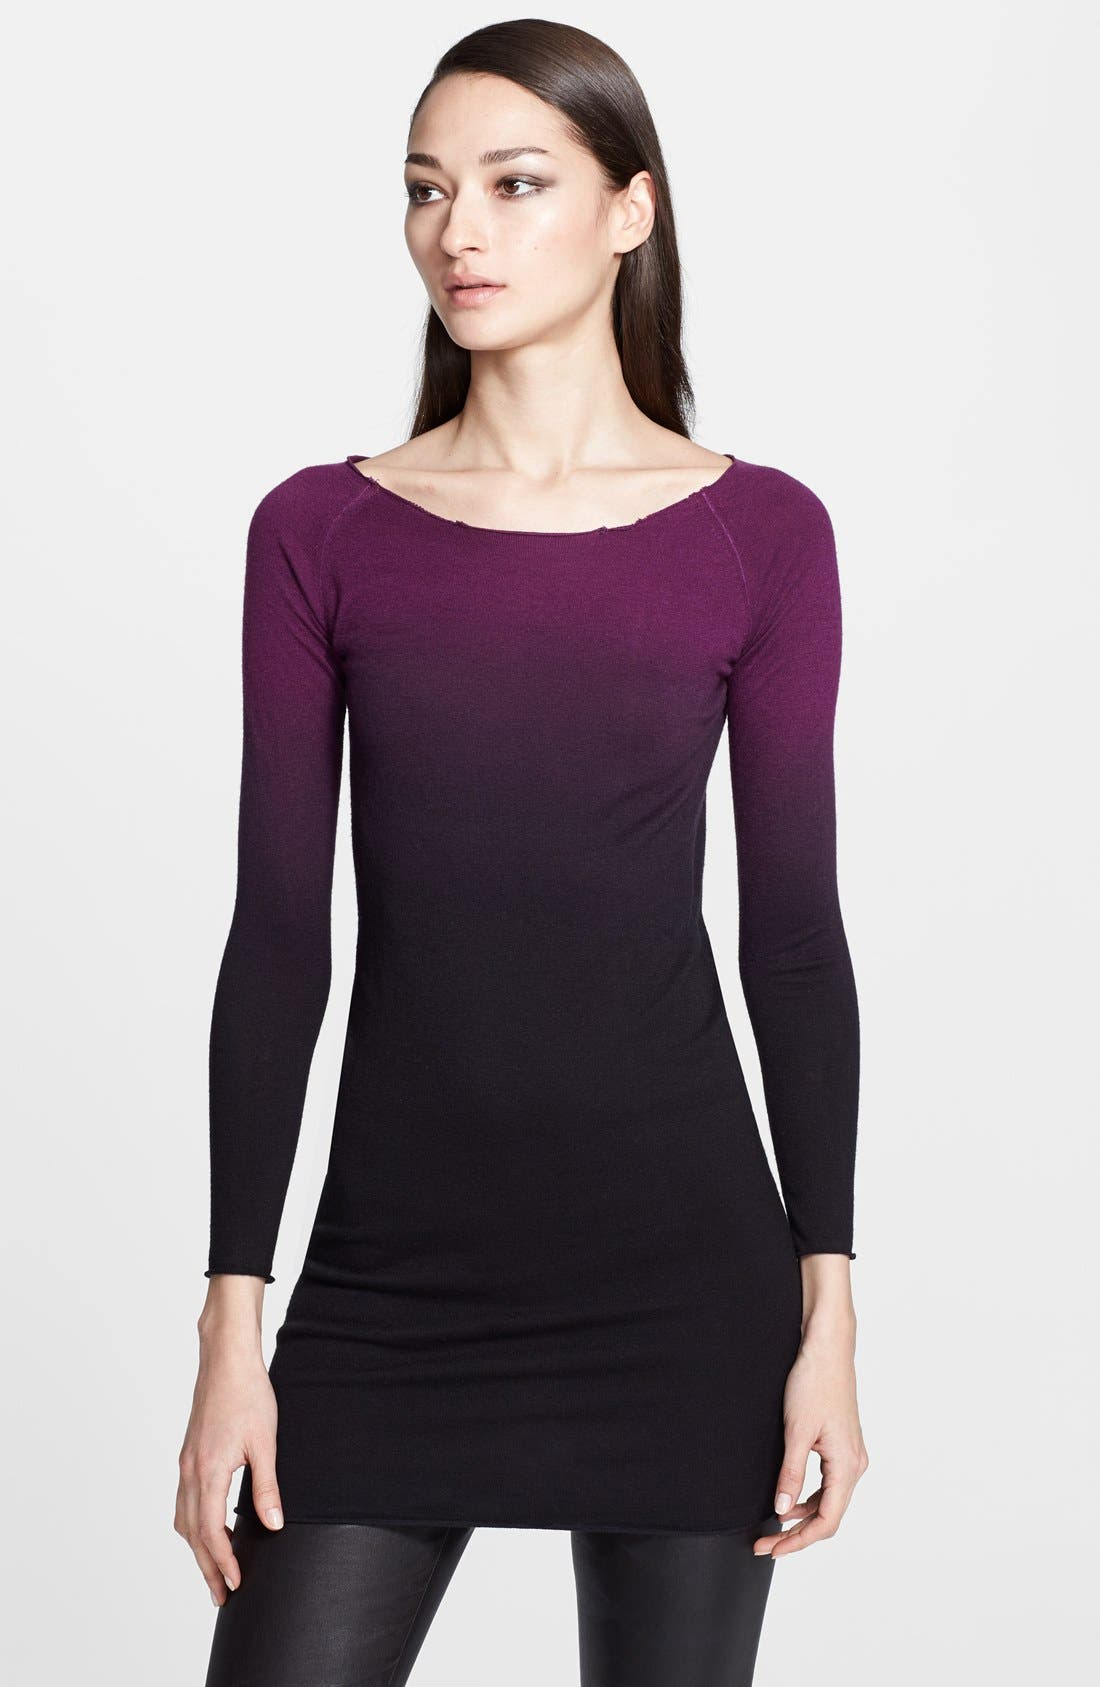 Alternate Image 1 Selected - Donna Karan Collection Ombré Cashmere Sweater